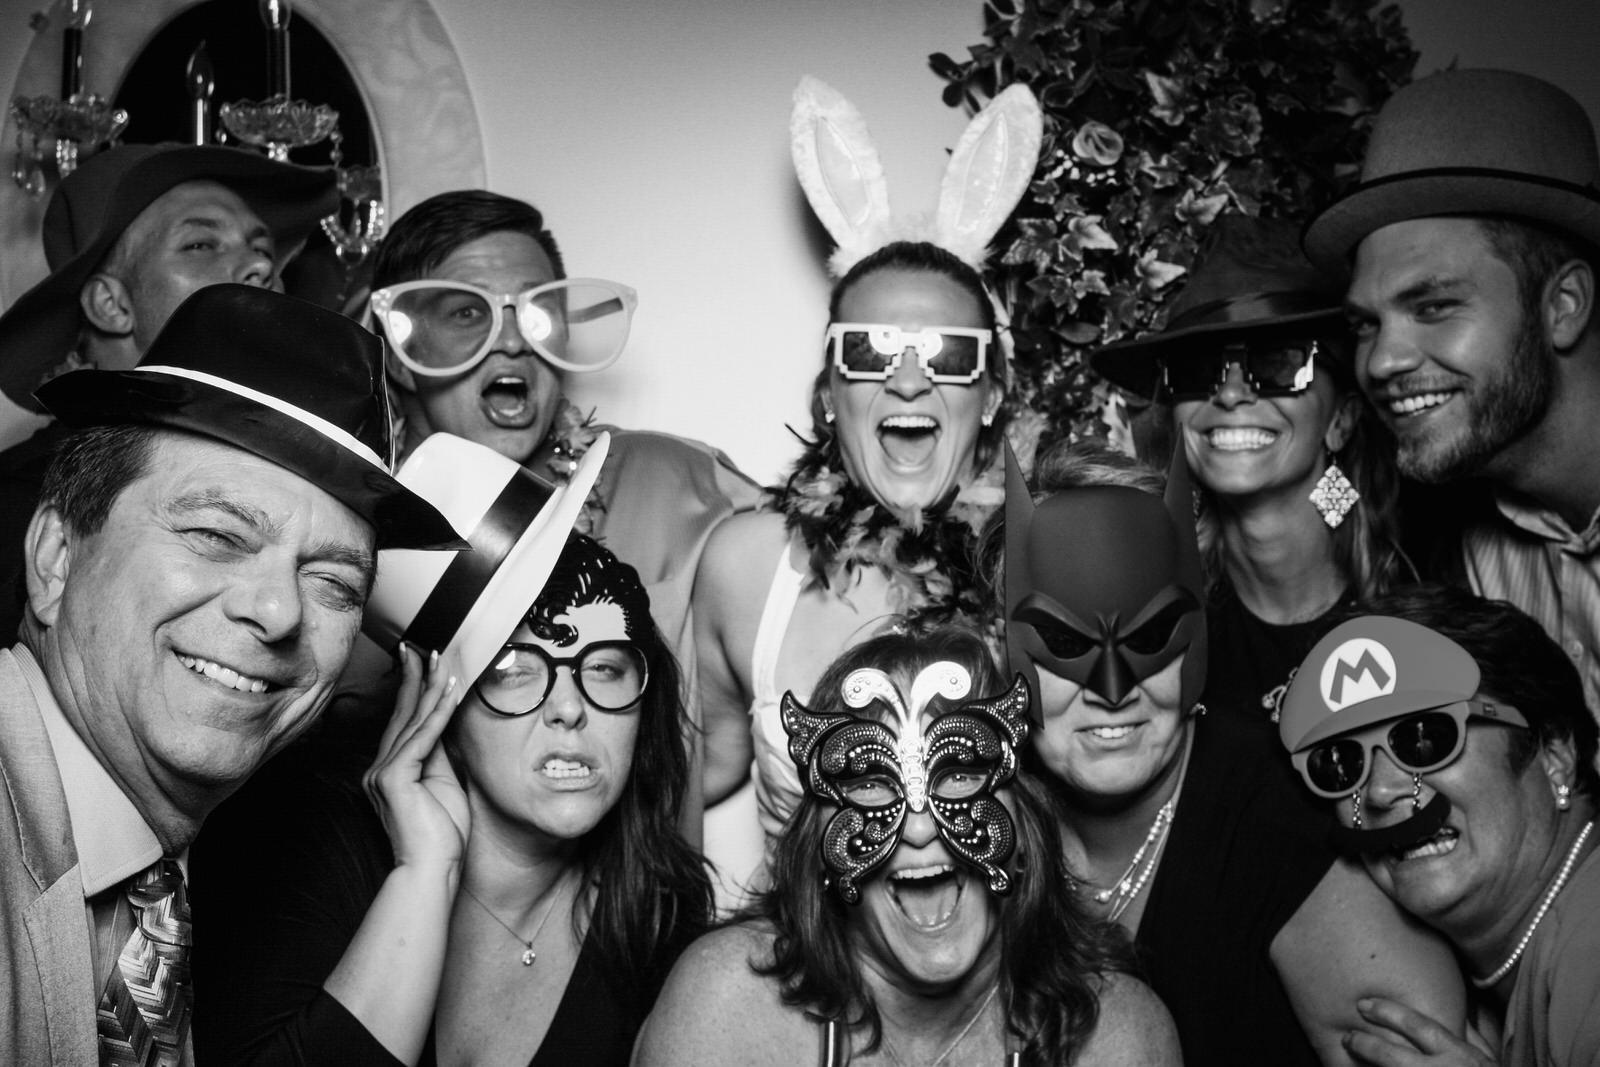 Ryan-Christine-Wedding-Photo-Booth-9.jpg